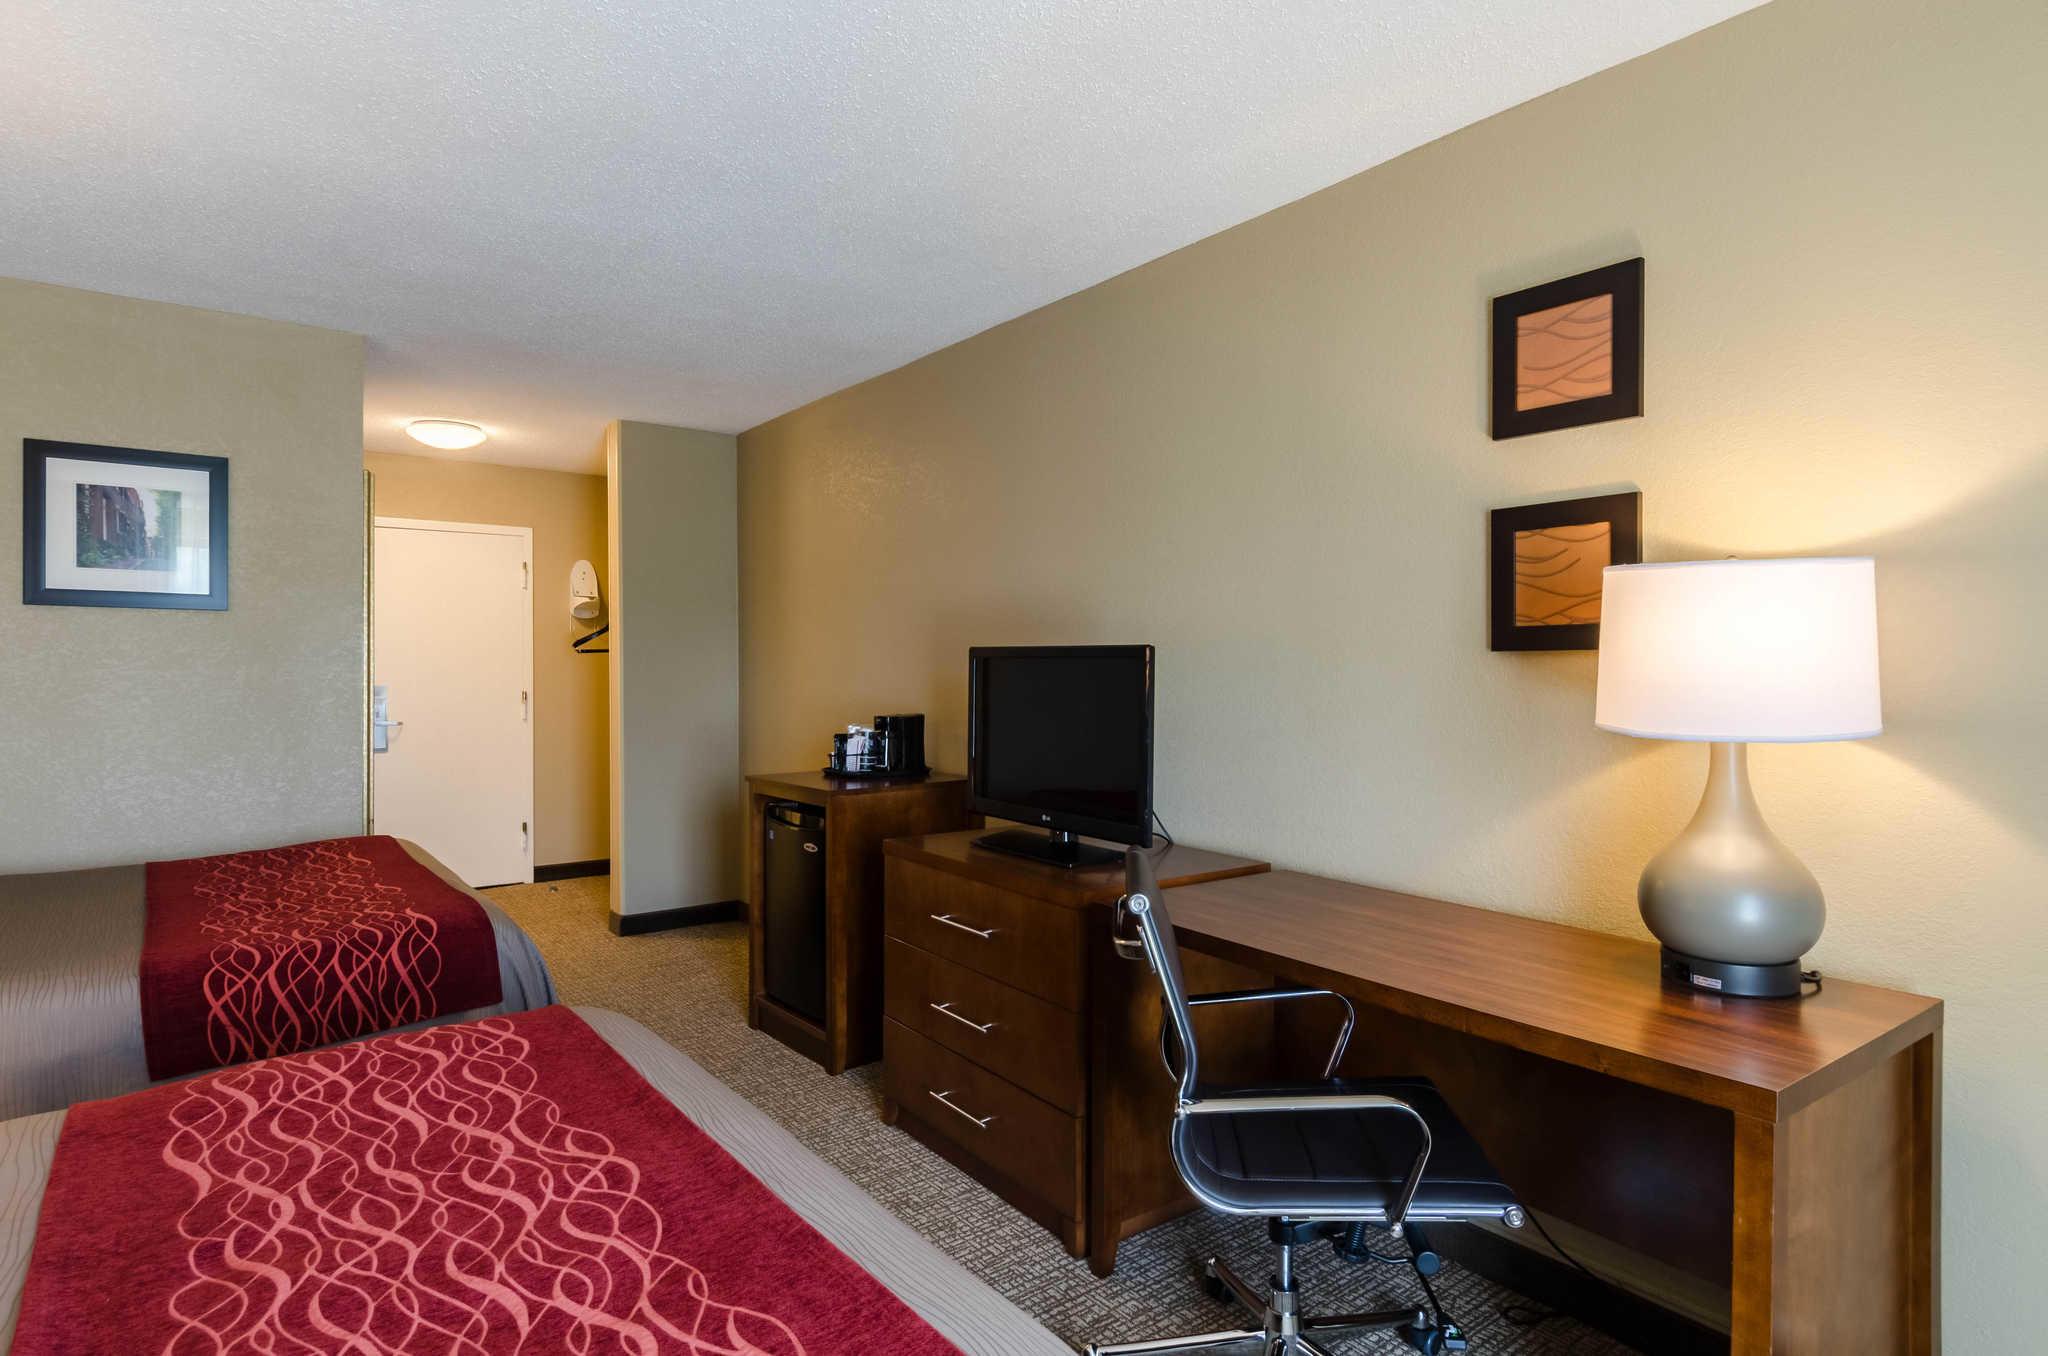 Comfort Inn Randolph - Boston image 5